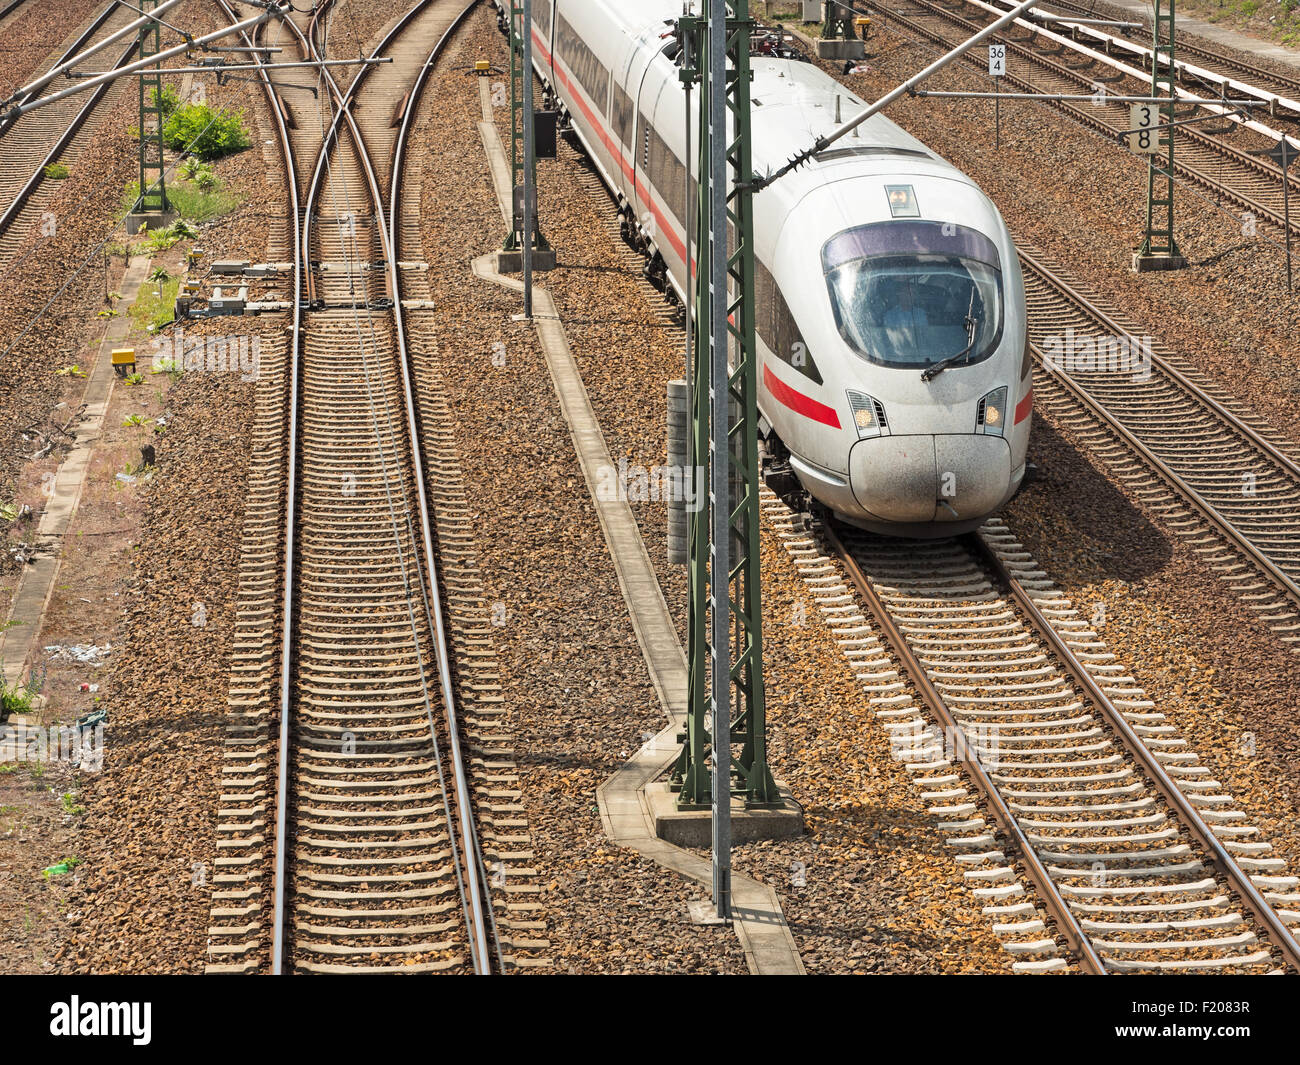 ICE Zug auf gerader Strecke - Stock Image